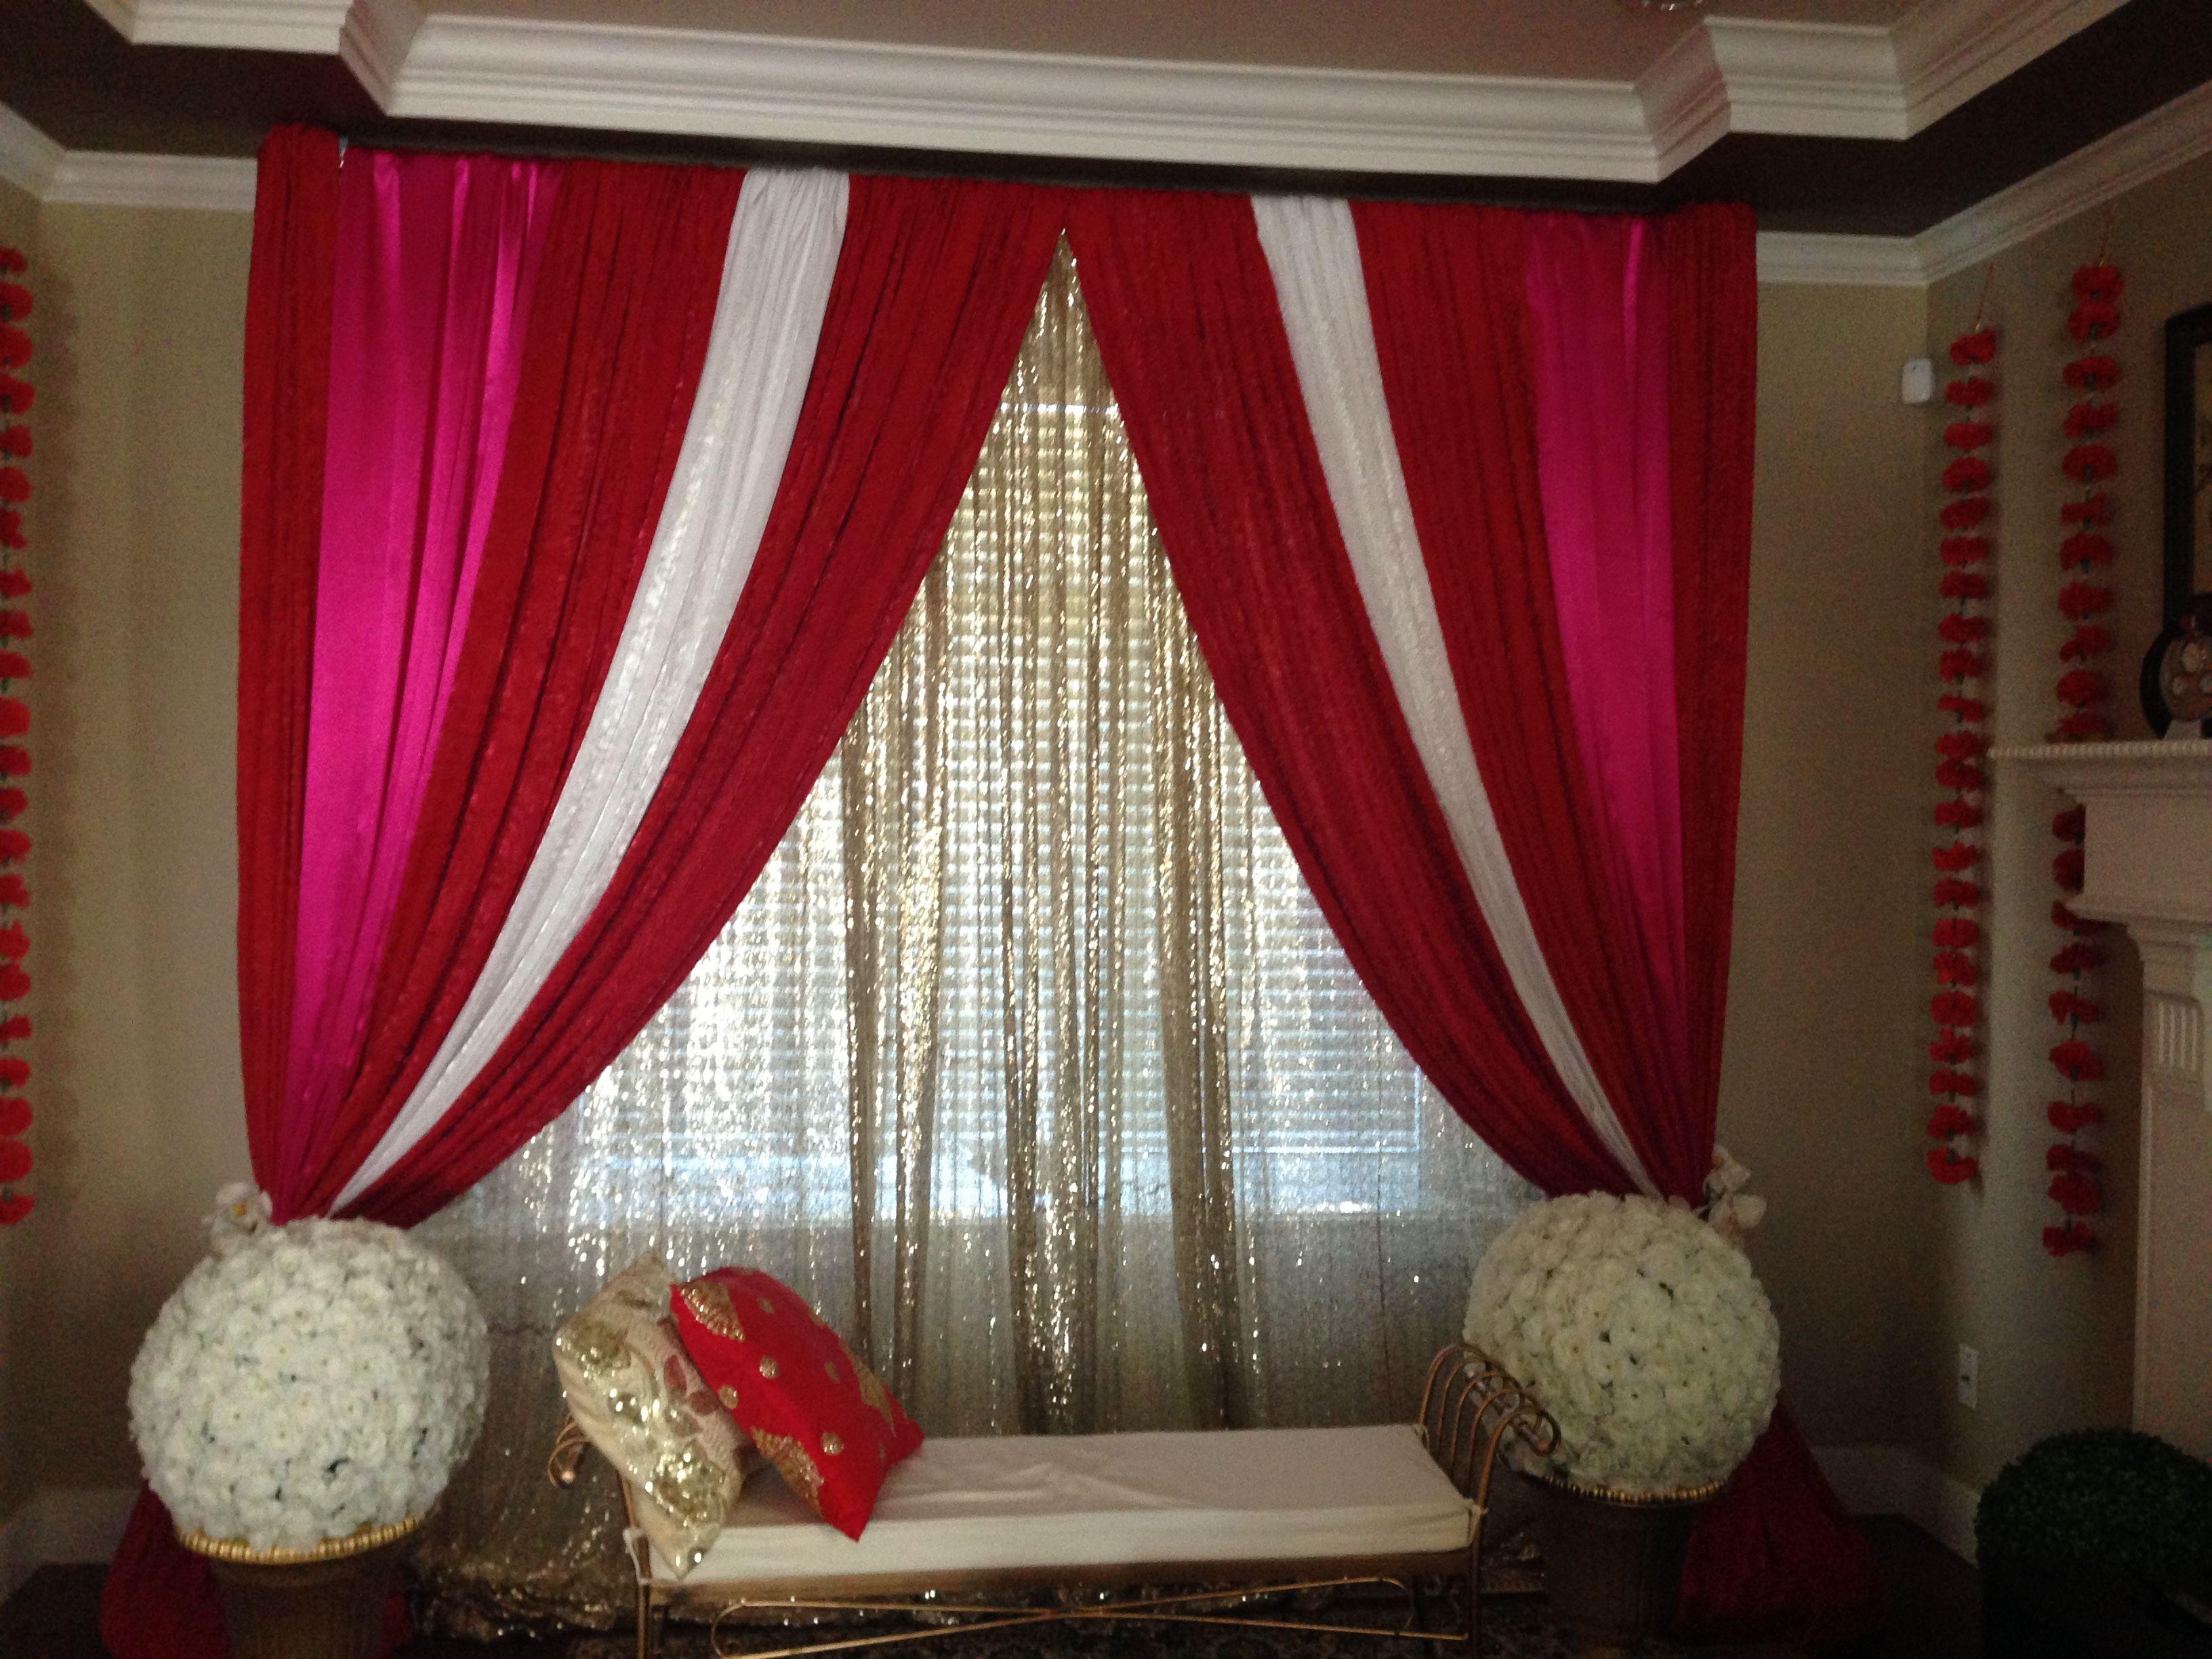 Wedding house decoration ideas  Pin by Raz Mal on Indian wedding house decor  Pinterest  Weddings